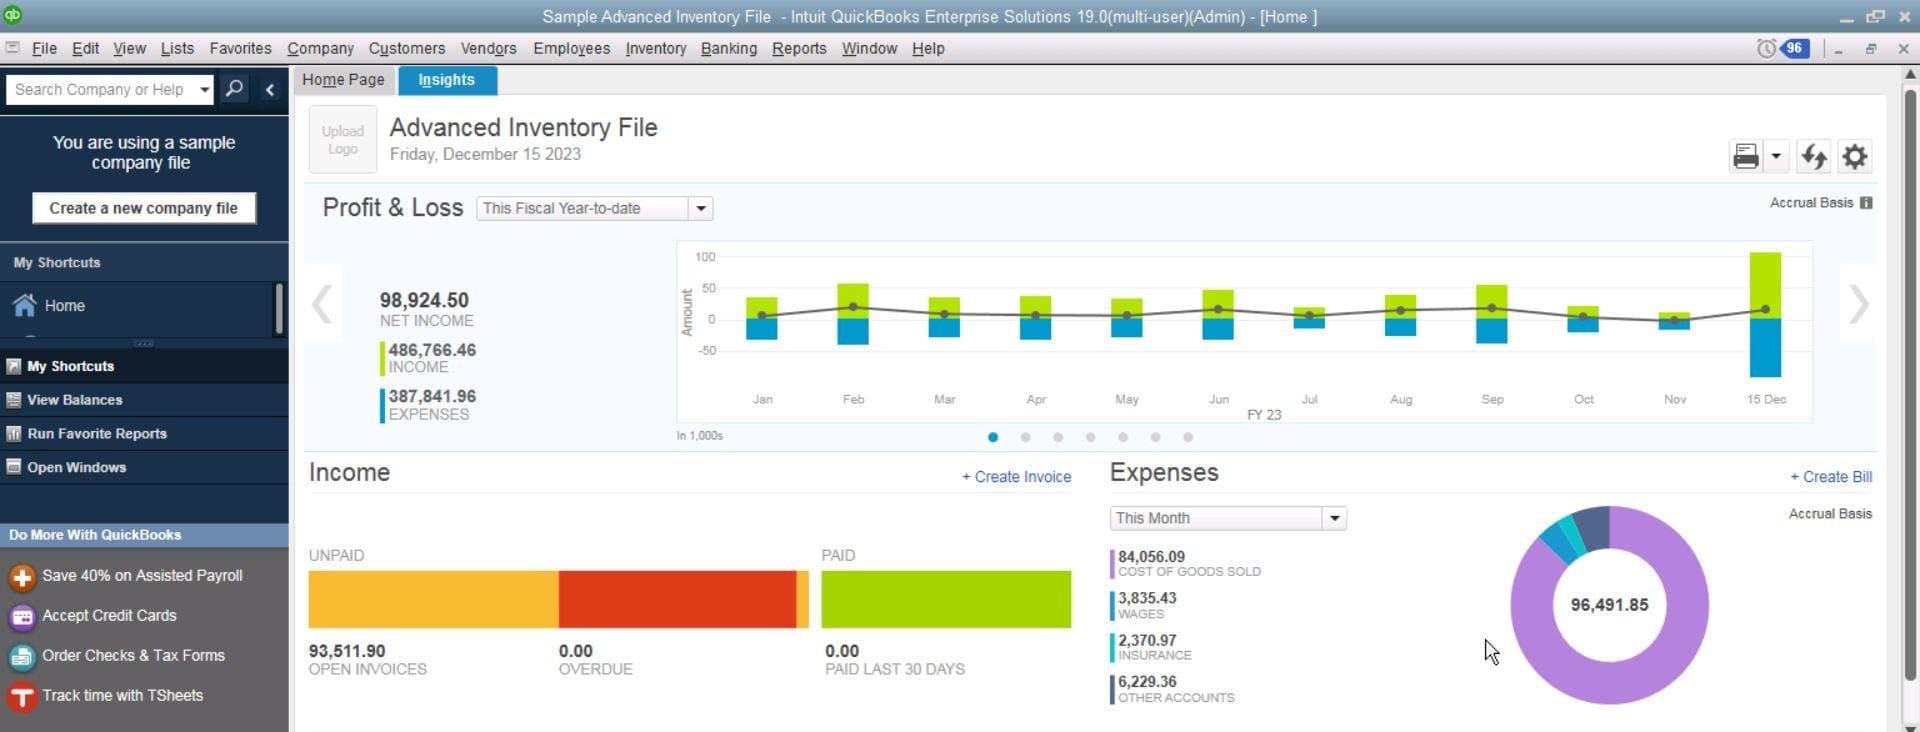 QuickBooks Desktop Enterprise Software - QuickBooks Enterprise Advanced Inventory File